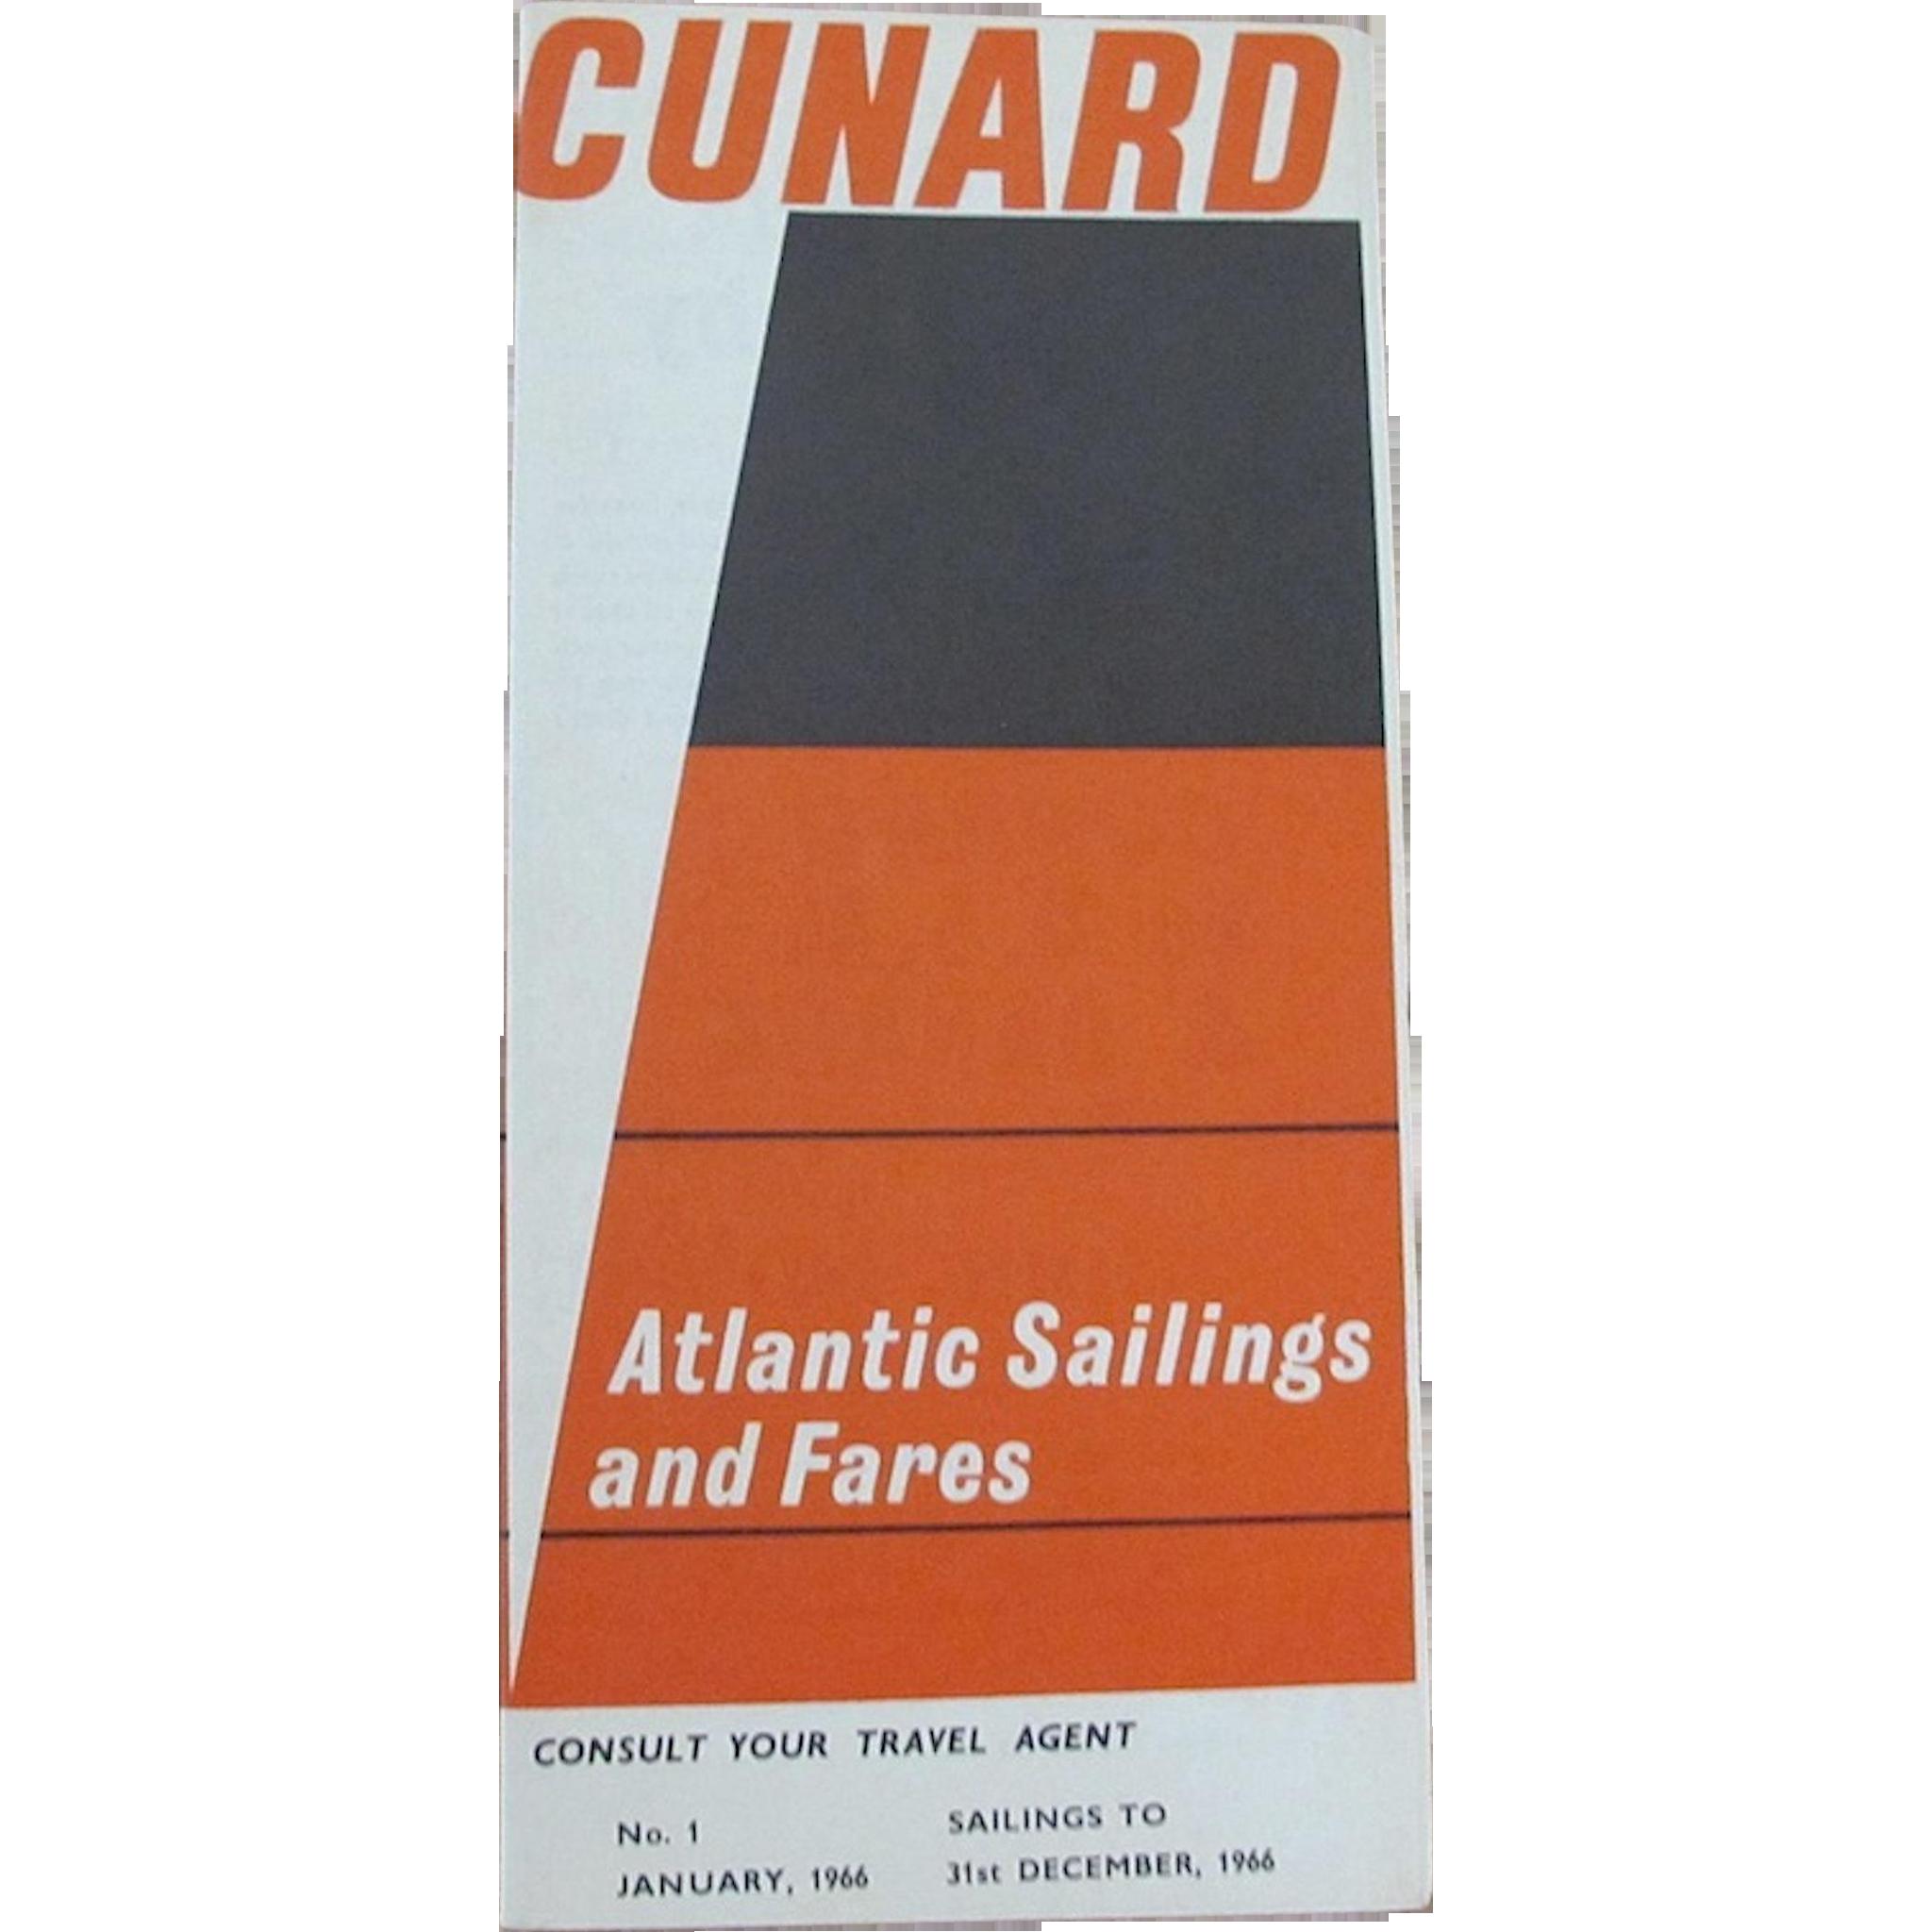 CUNARD: Atlantic Sailings and Fares